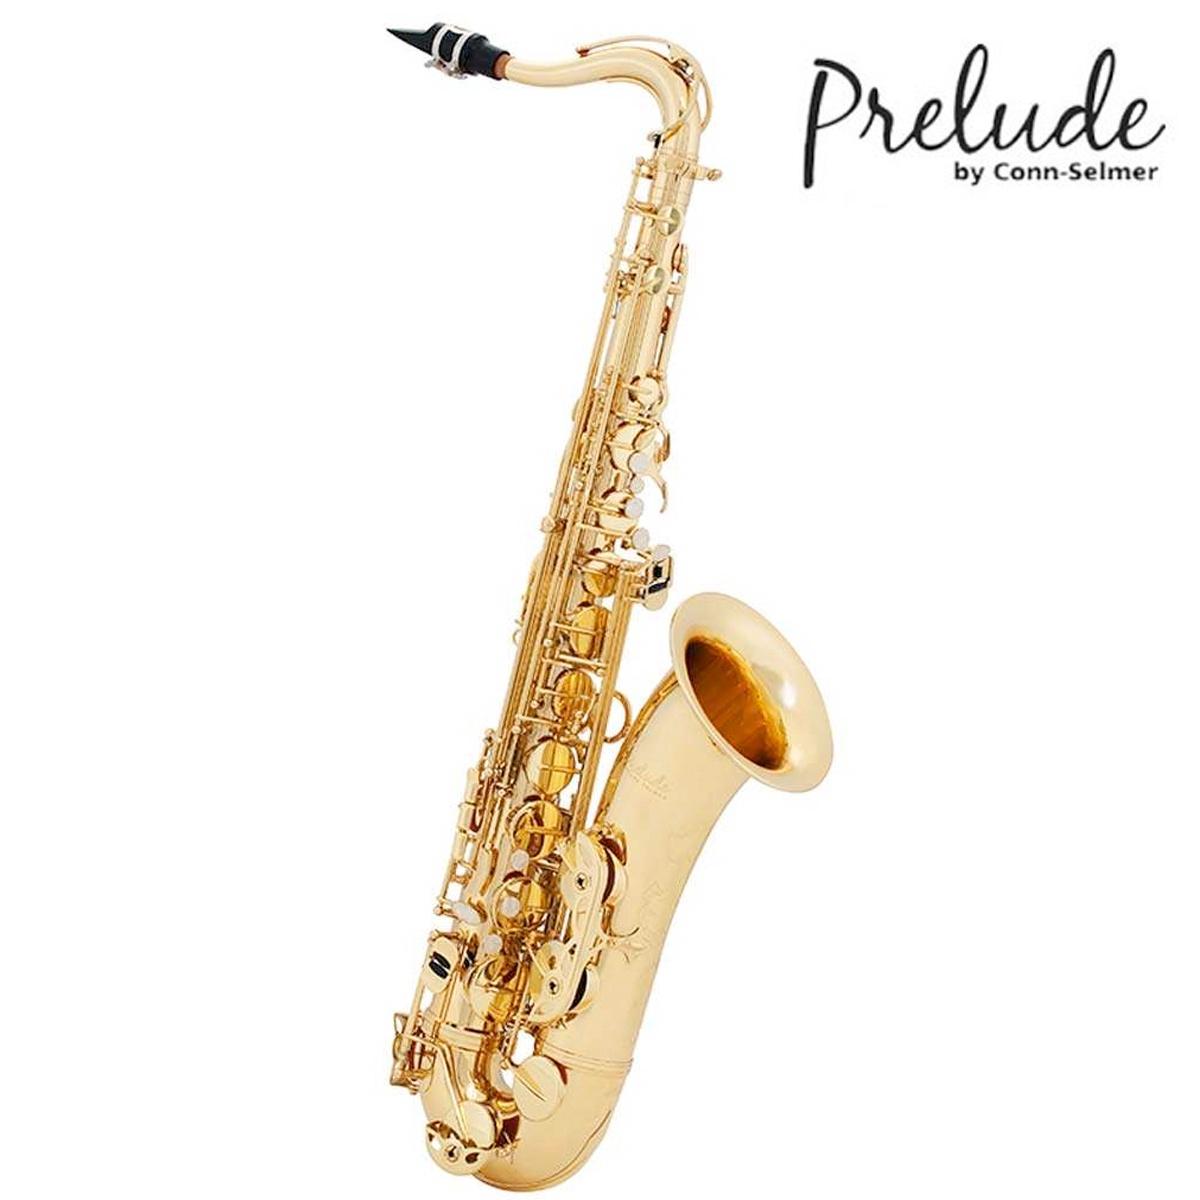 Prelude by Conn Selmer Tenor Saxophone TS710